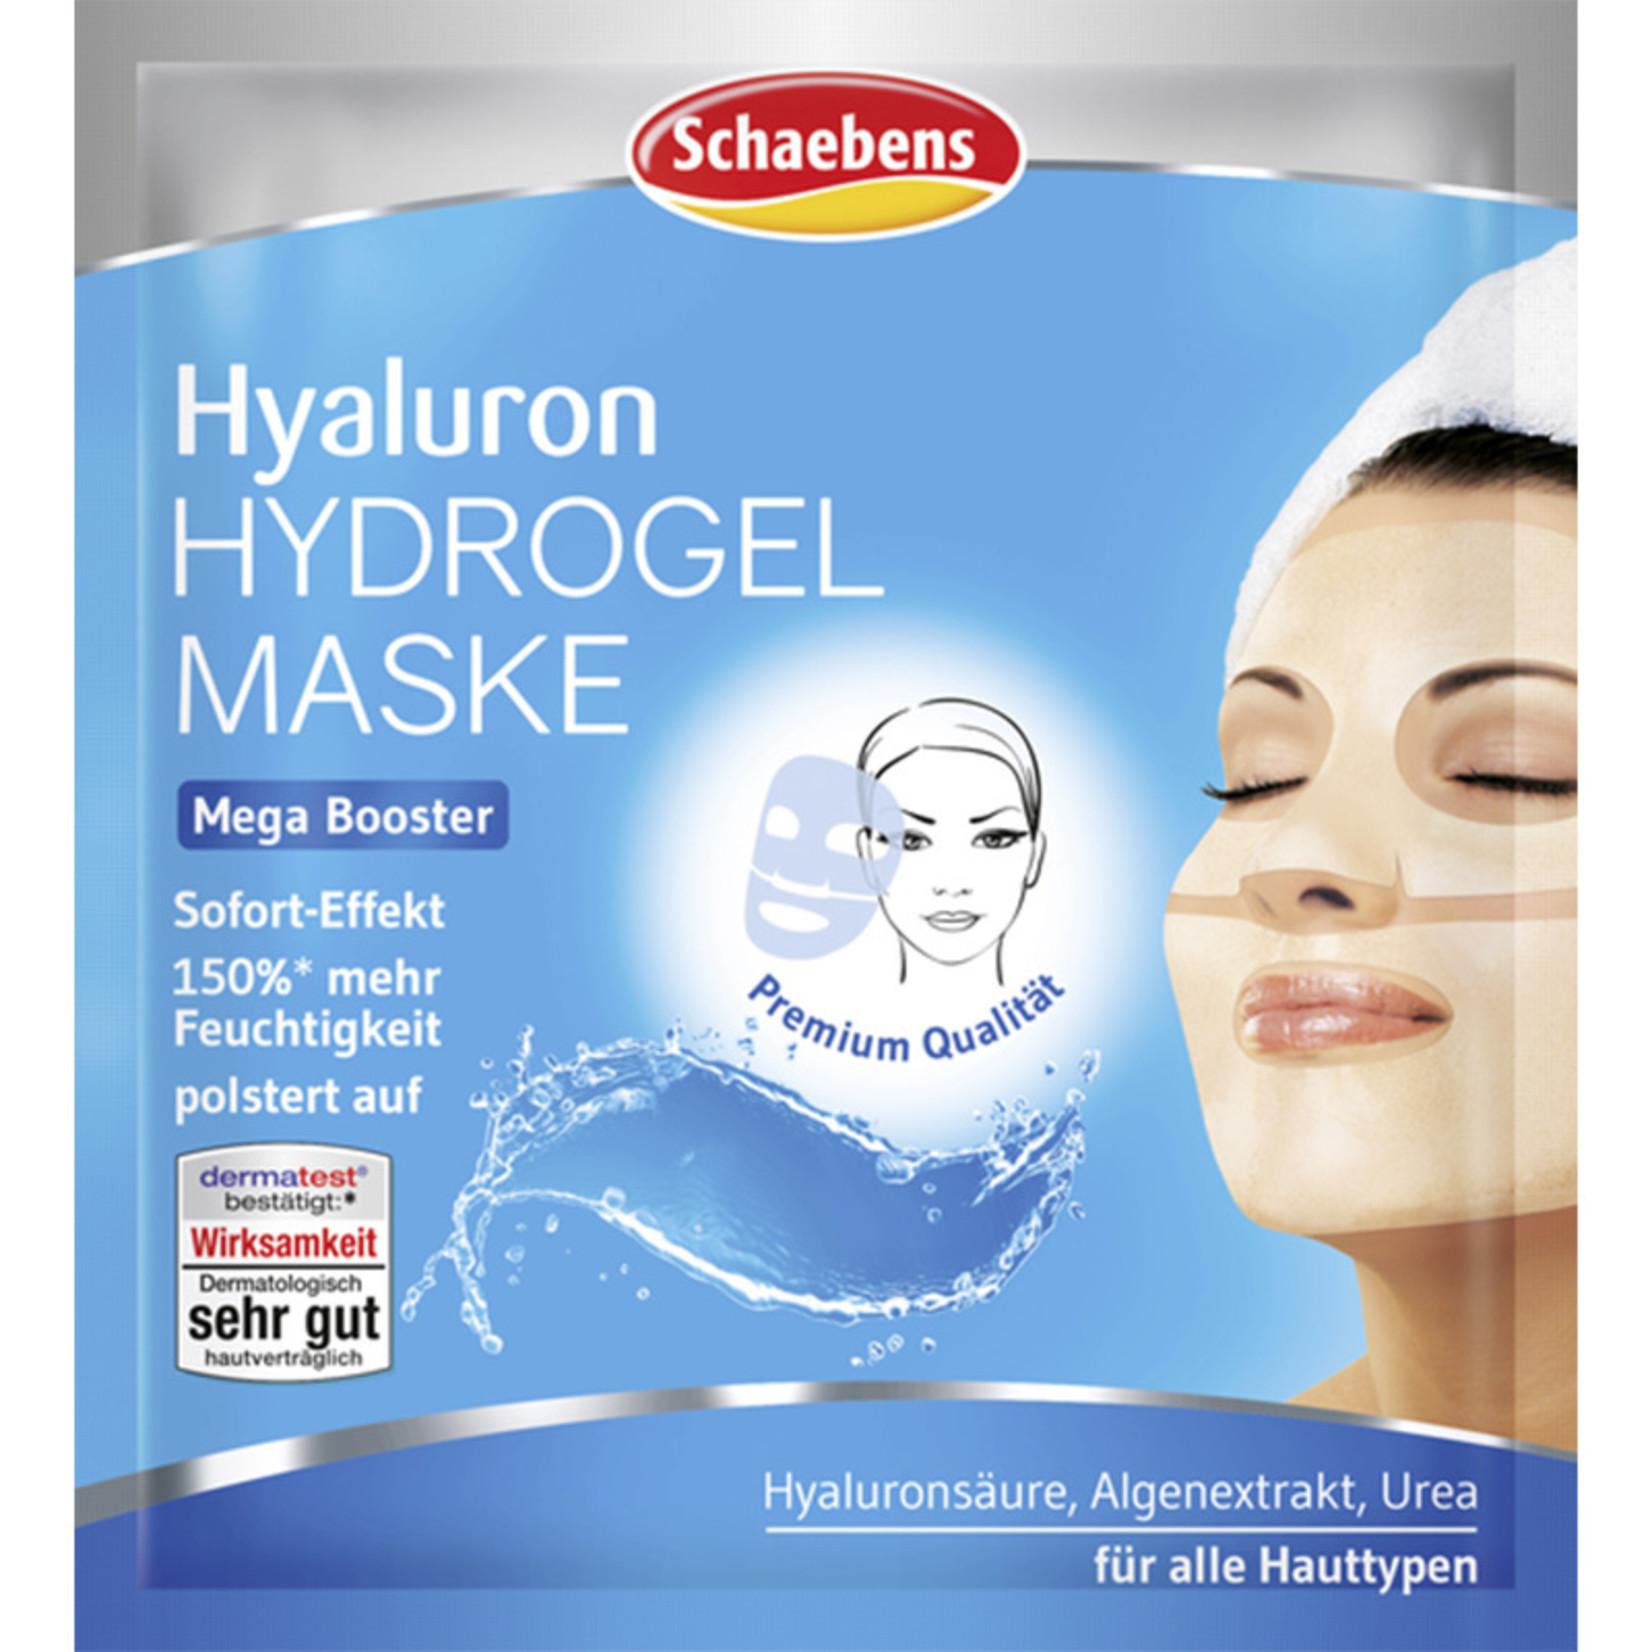 Schaebens Hyaluron Hydrogel Mask